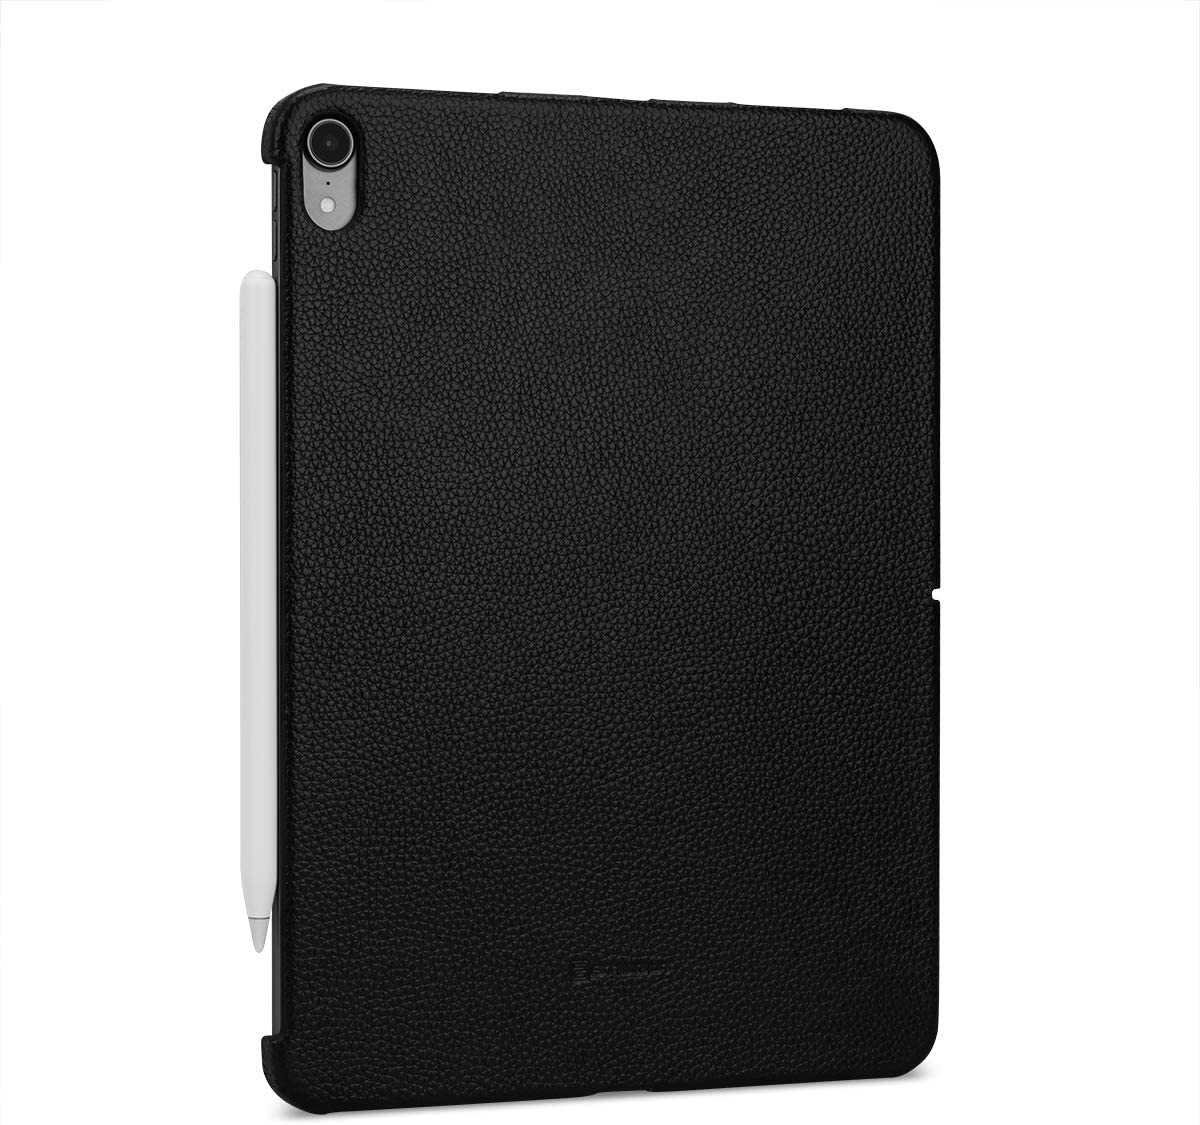 "StilGut Genuine Leather Case Back Cover for Apple iPad Pro 11"" (2018), Black"